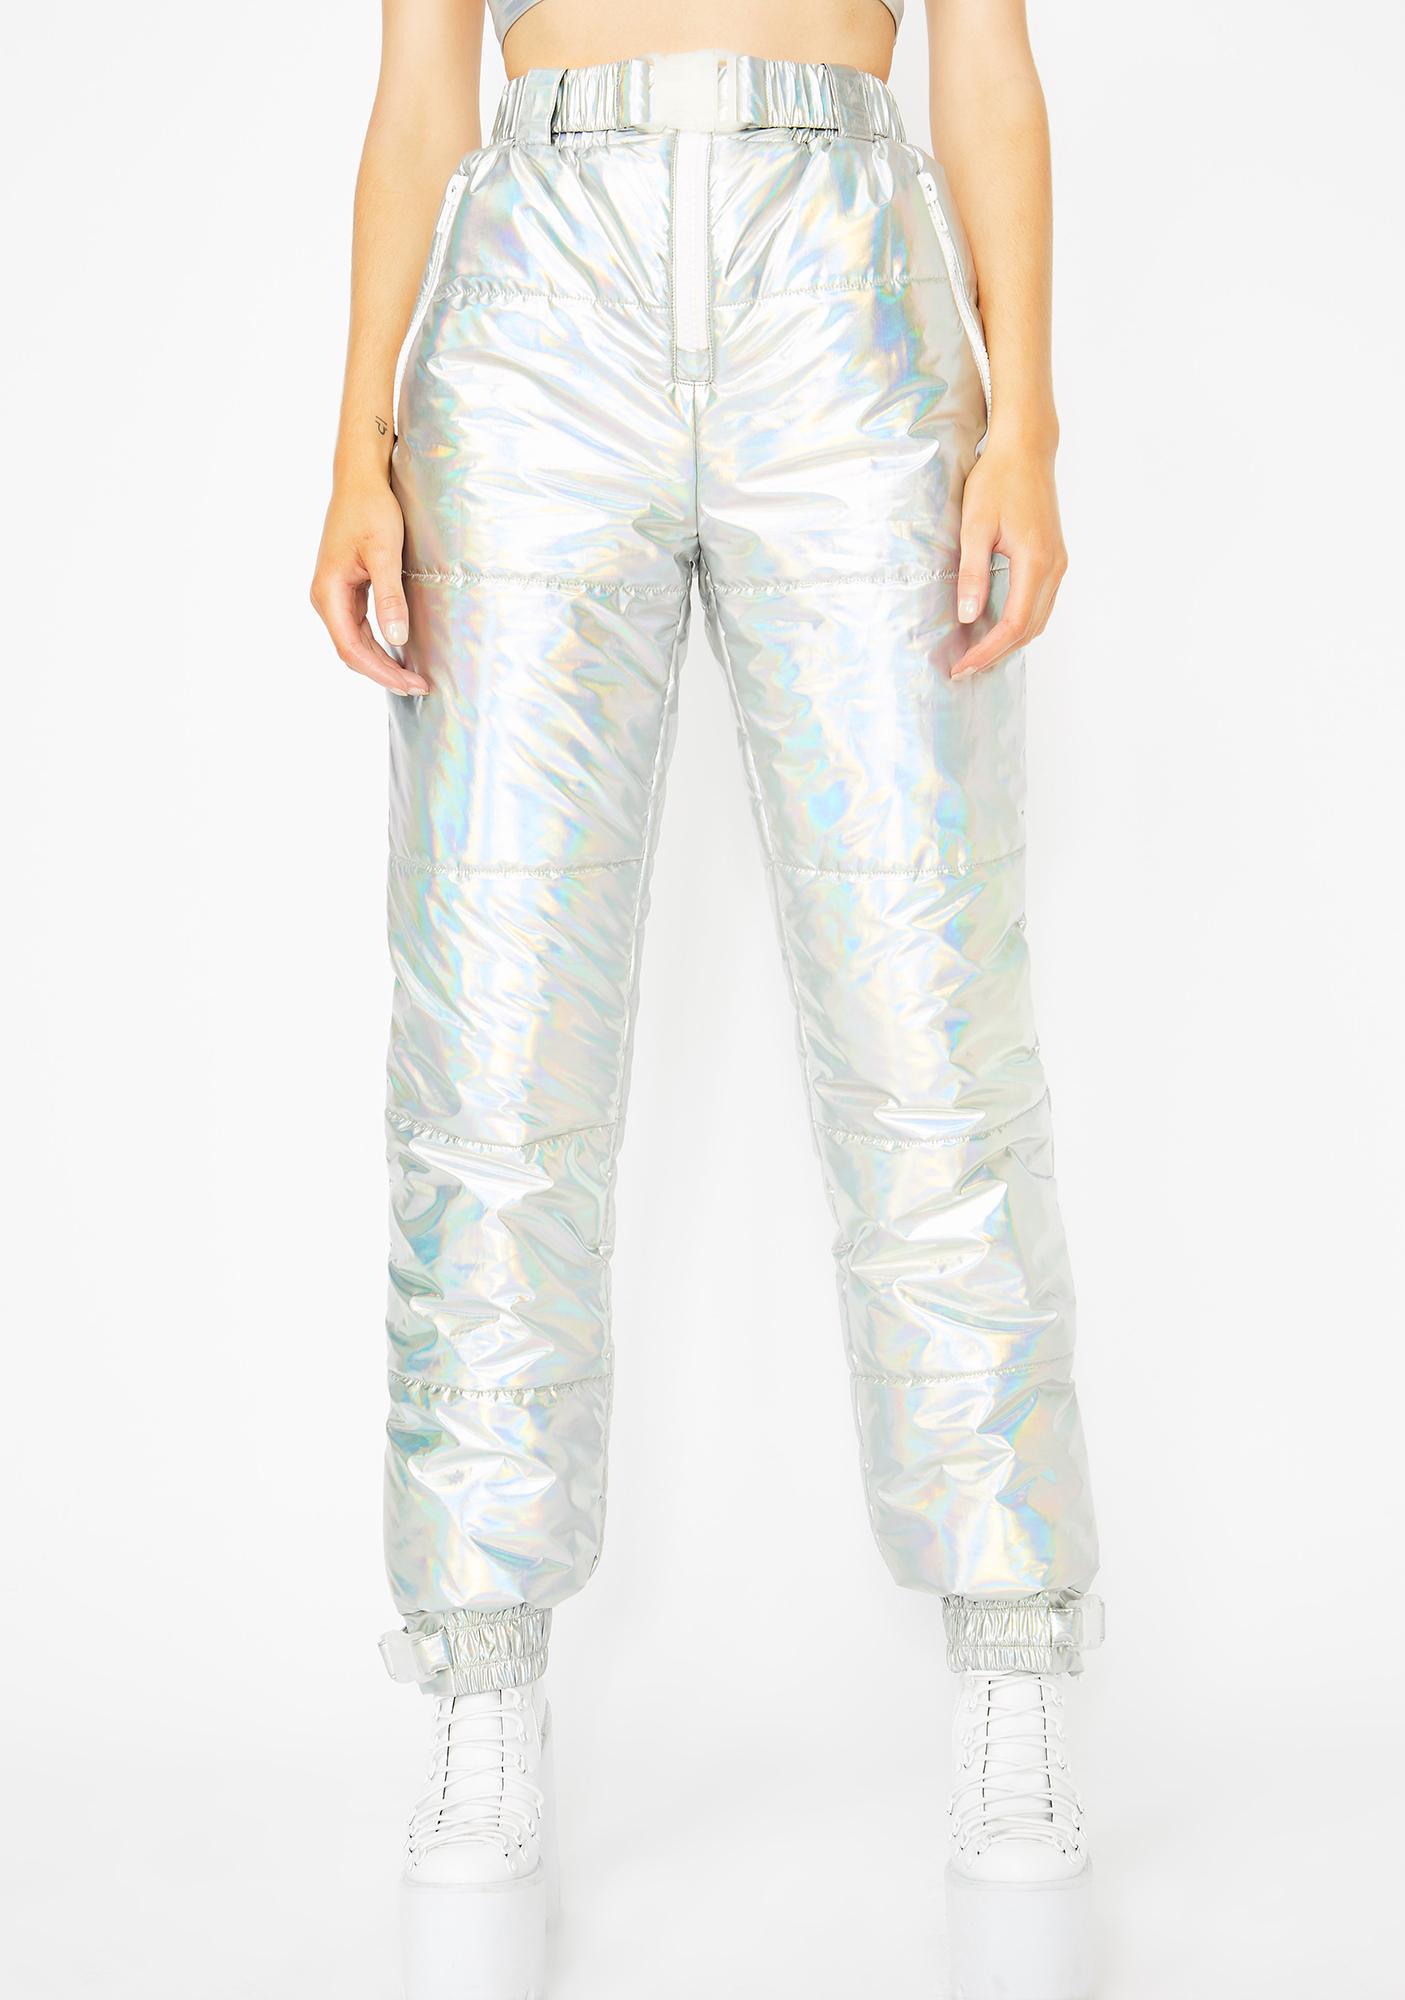 Club Exx Northern Soul Snow Pants